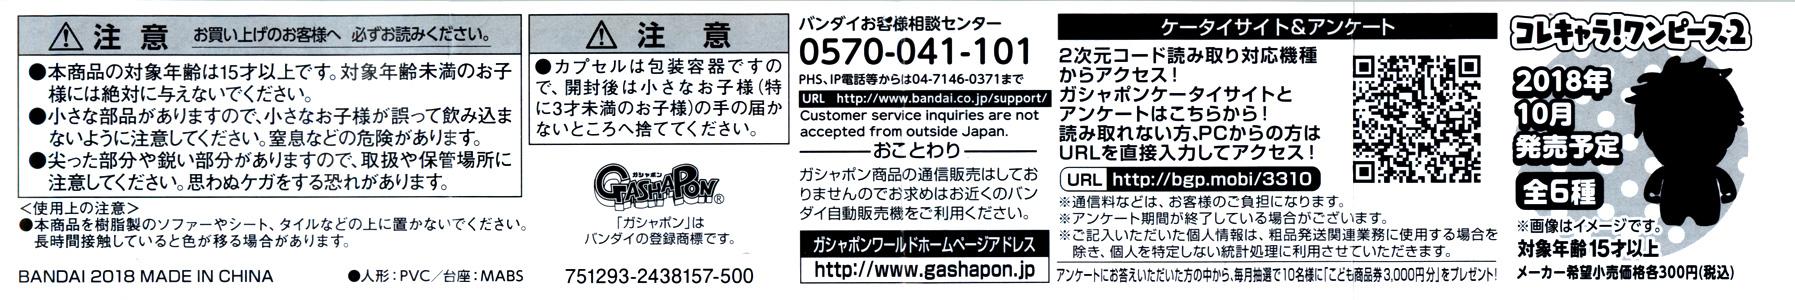 Gasha Portraits ワンピース [バンダイ]